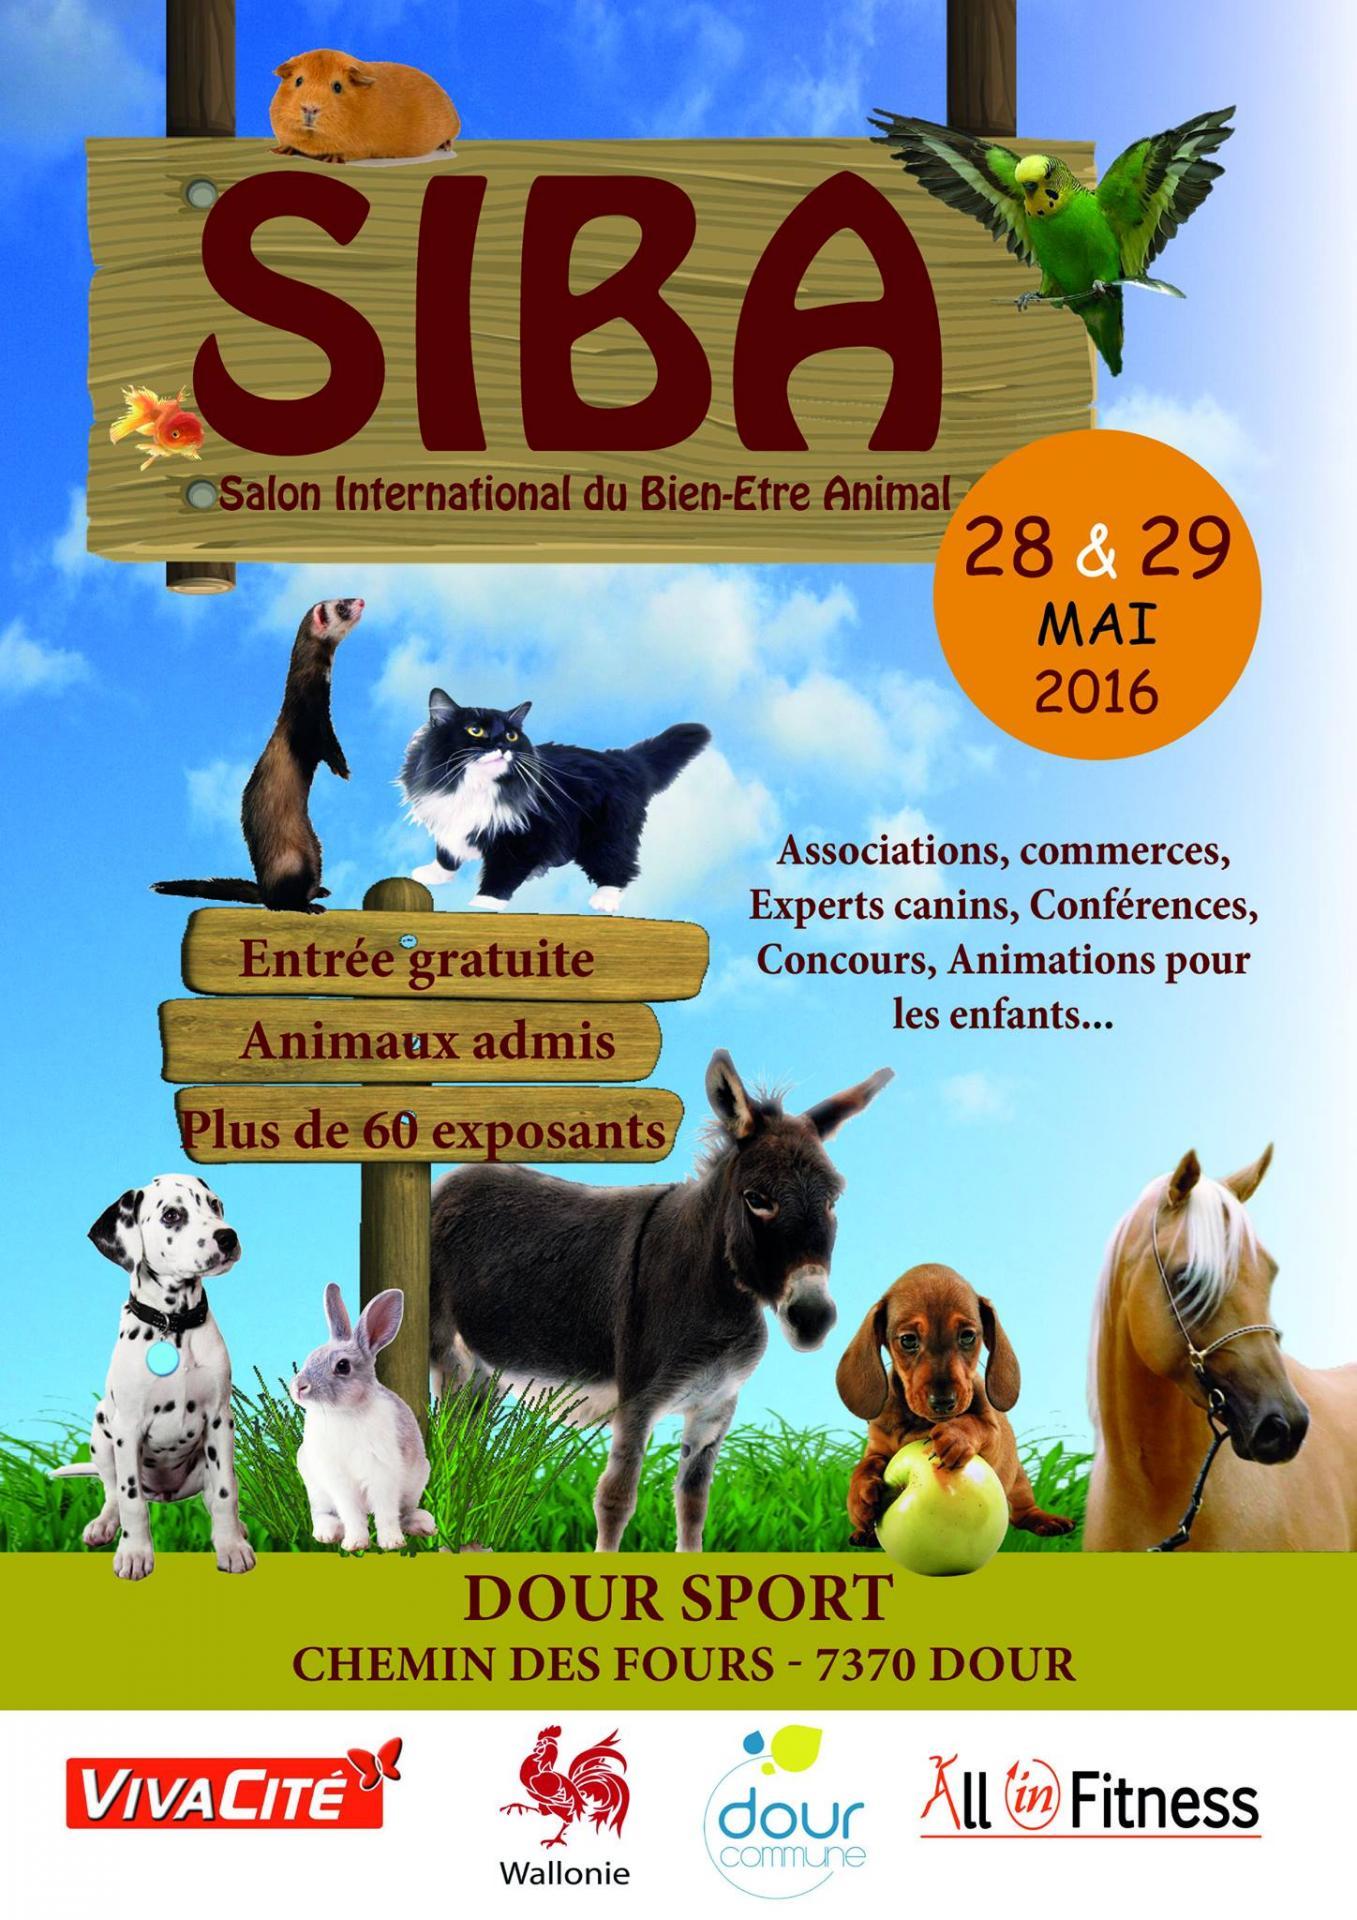 Siba16